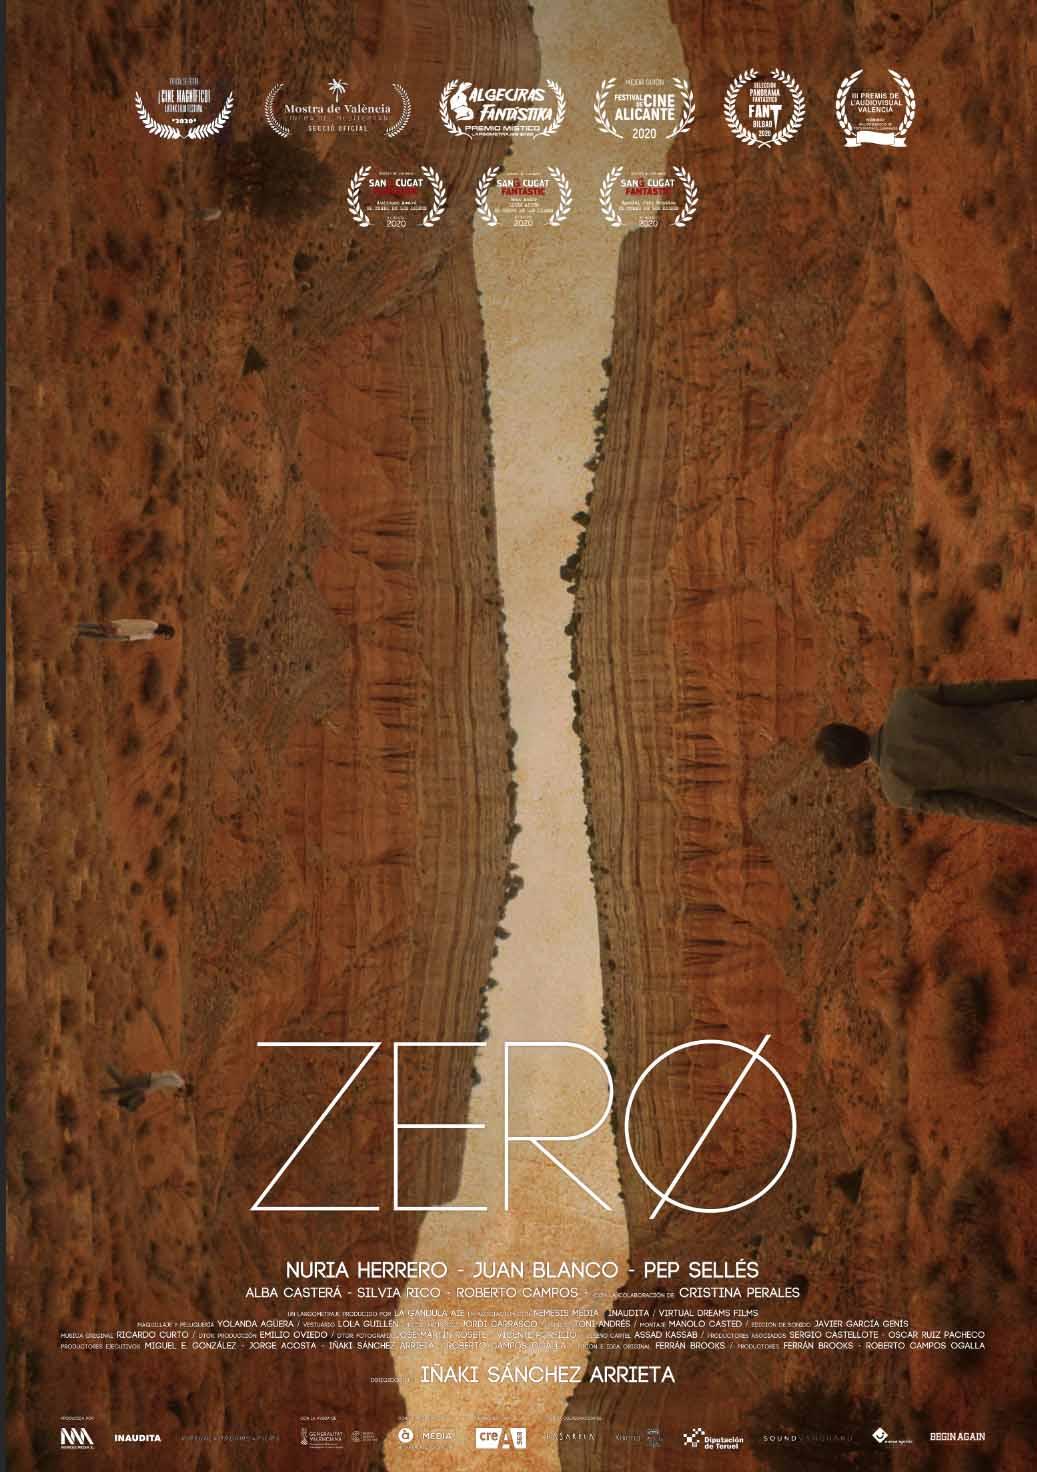 'Zerø', de Iñaki Sánchez Arrieta, Premio Místico a Mejor Largometraje en el Festival Algeciras Fantástika 2020